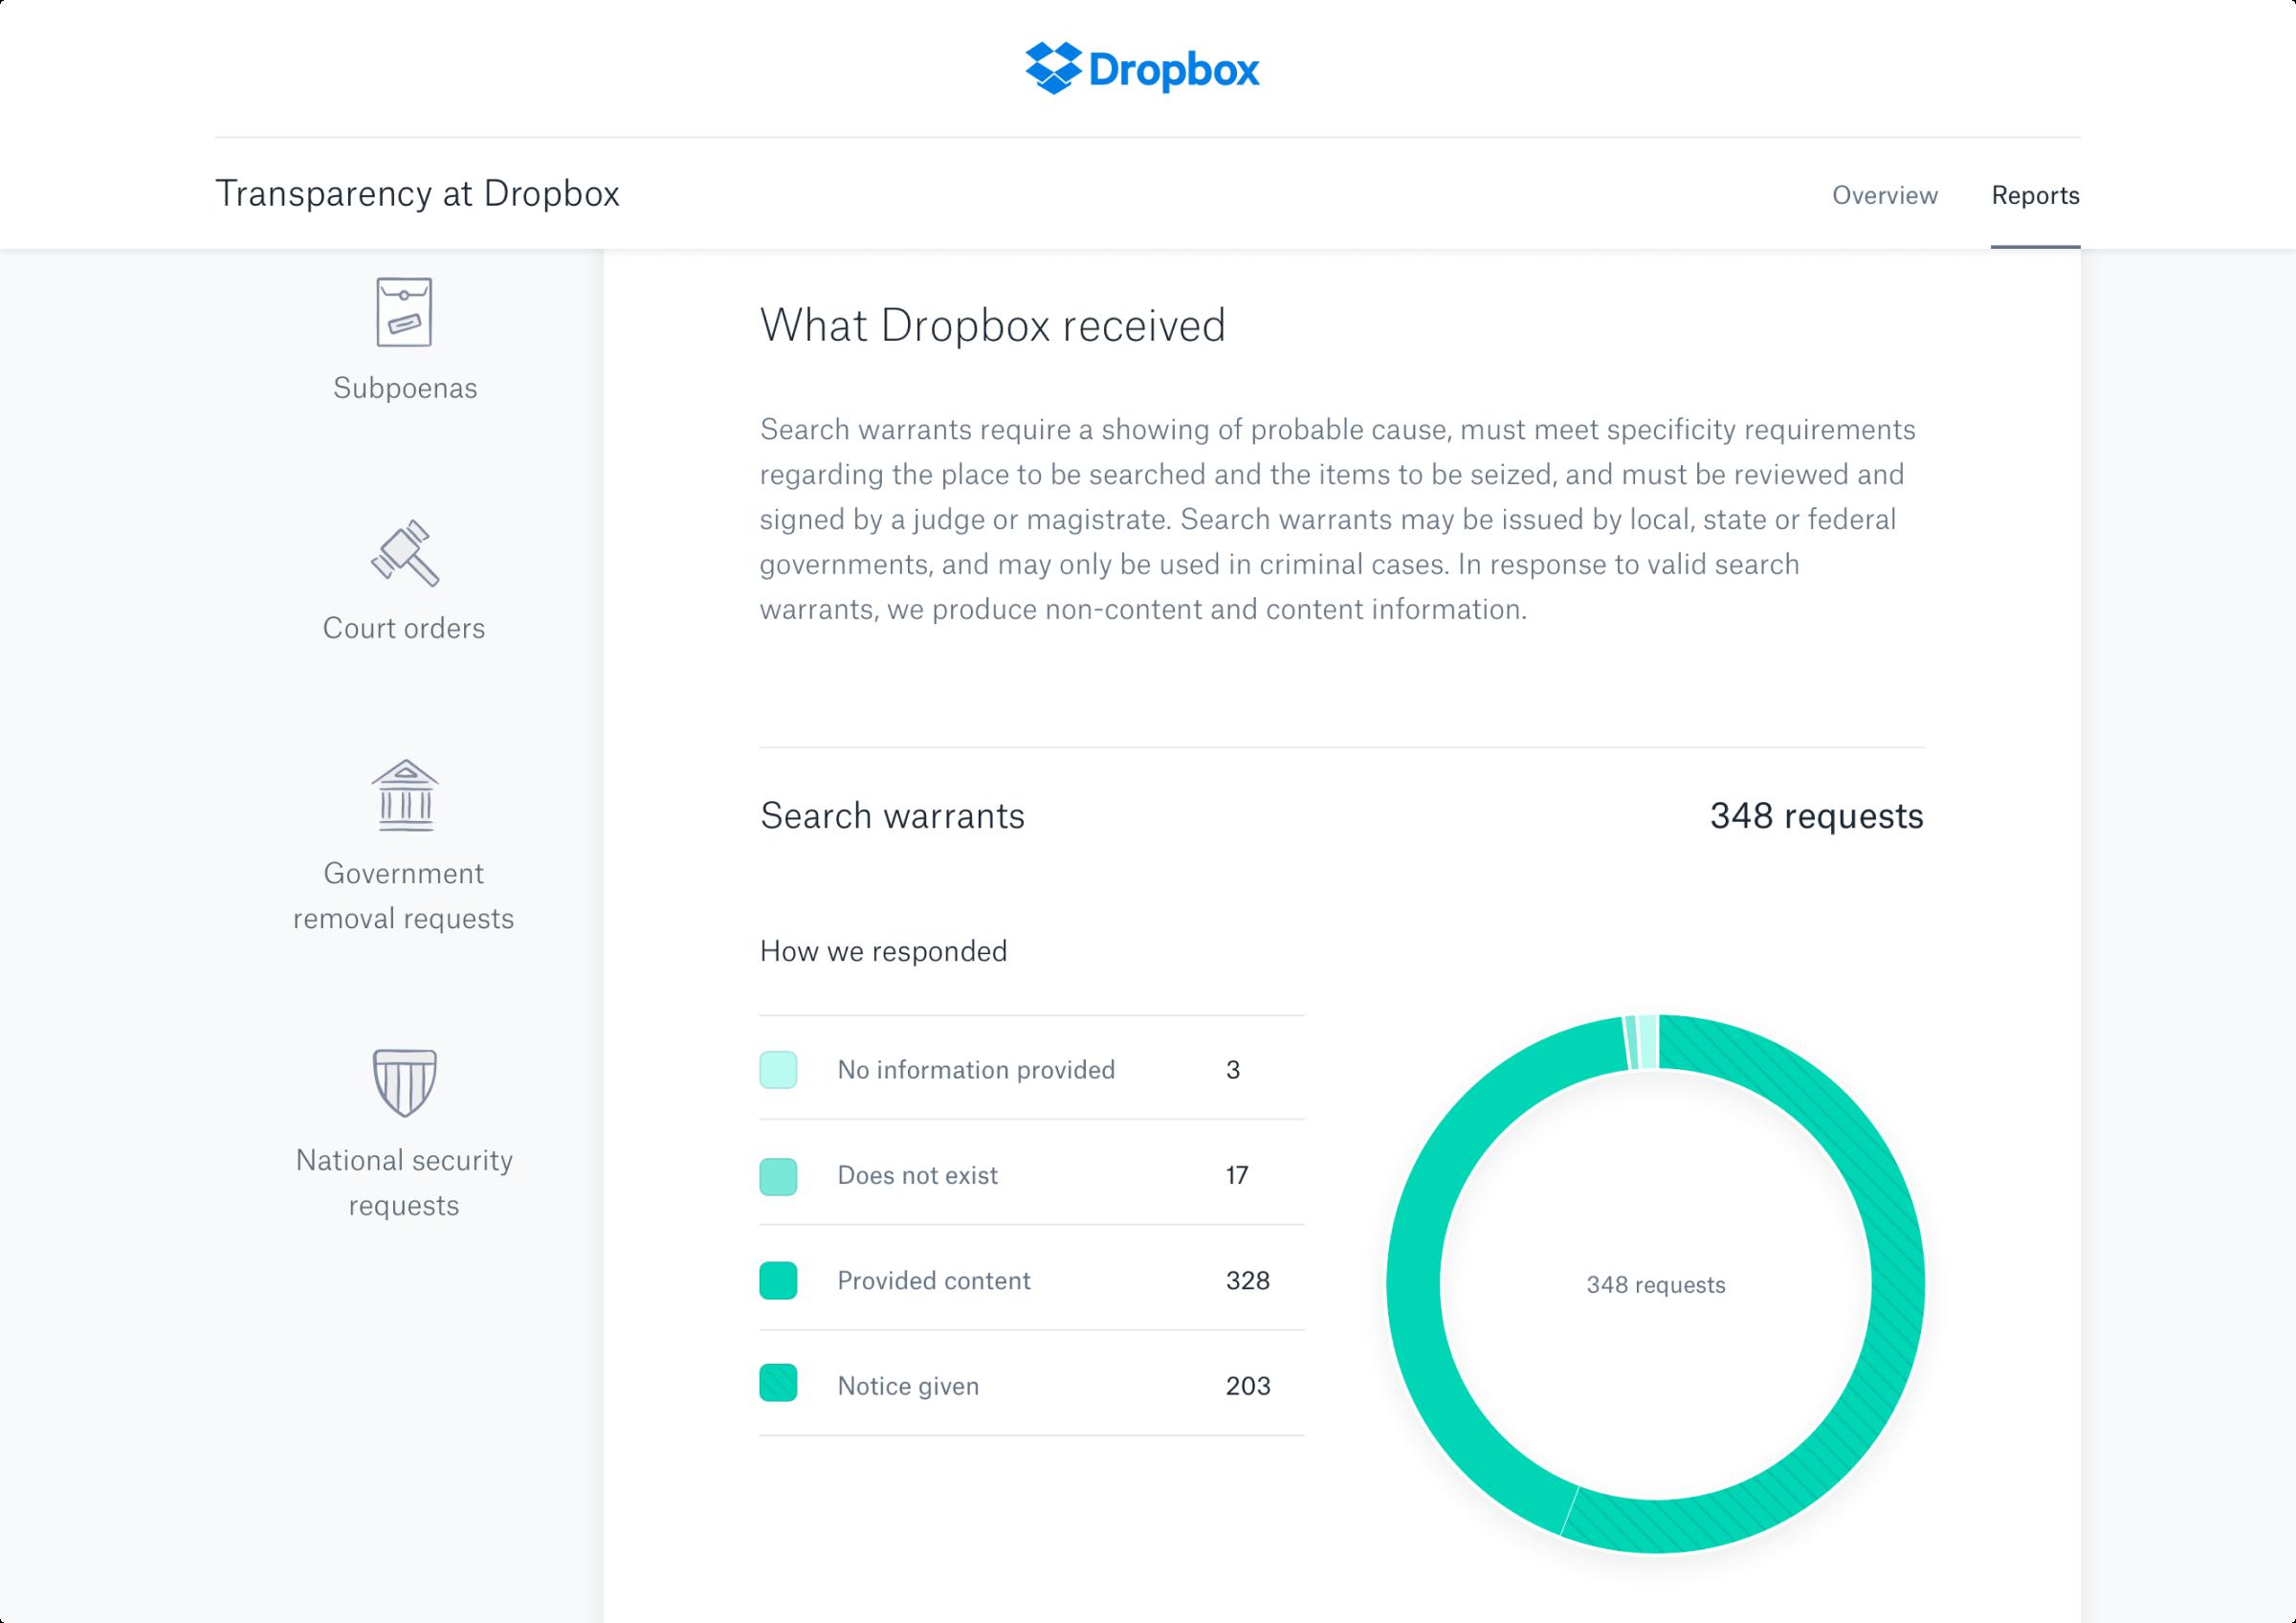 Transparency Reports - Breakdown